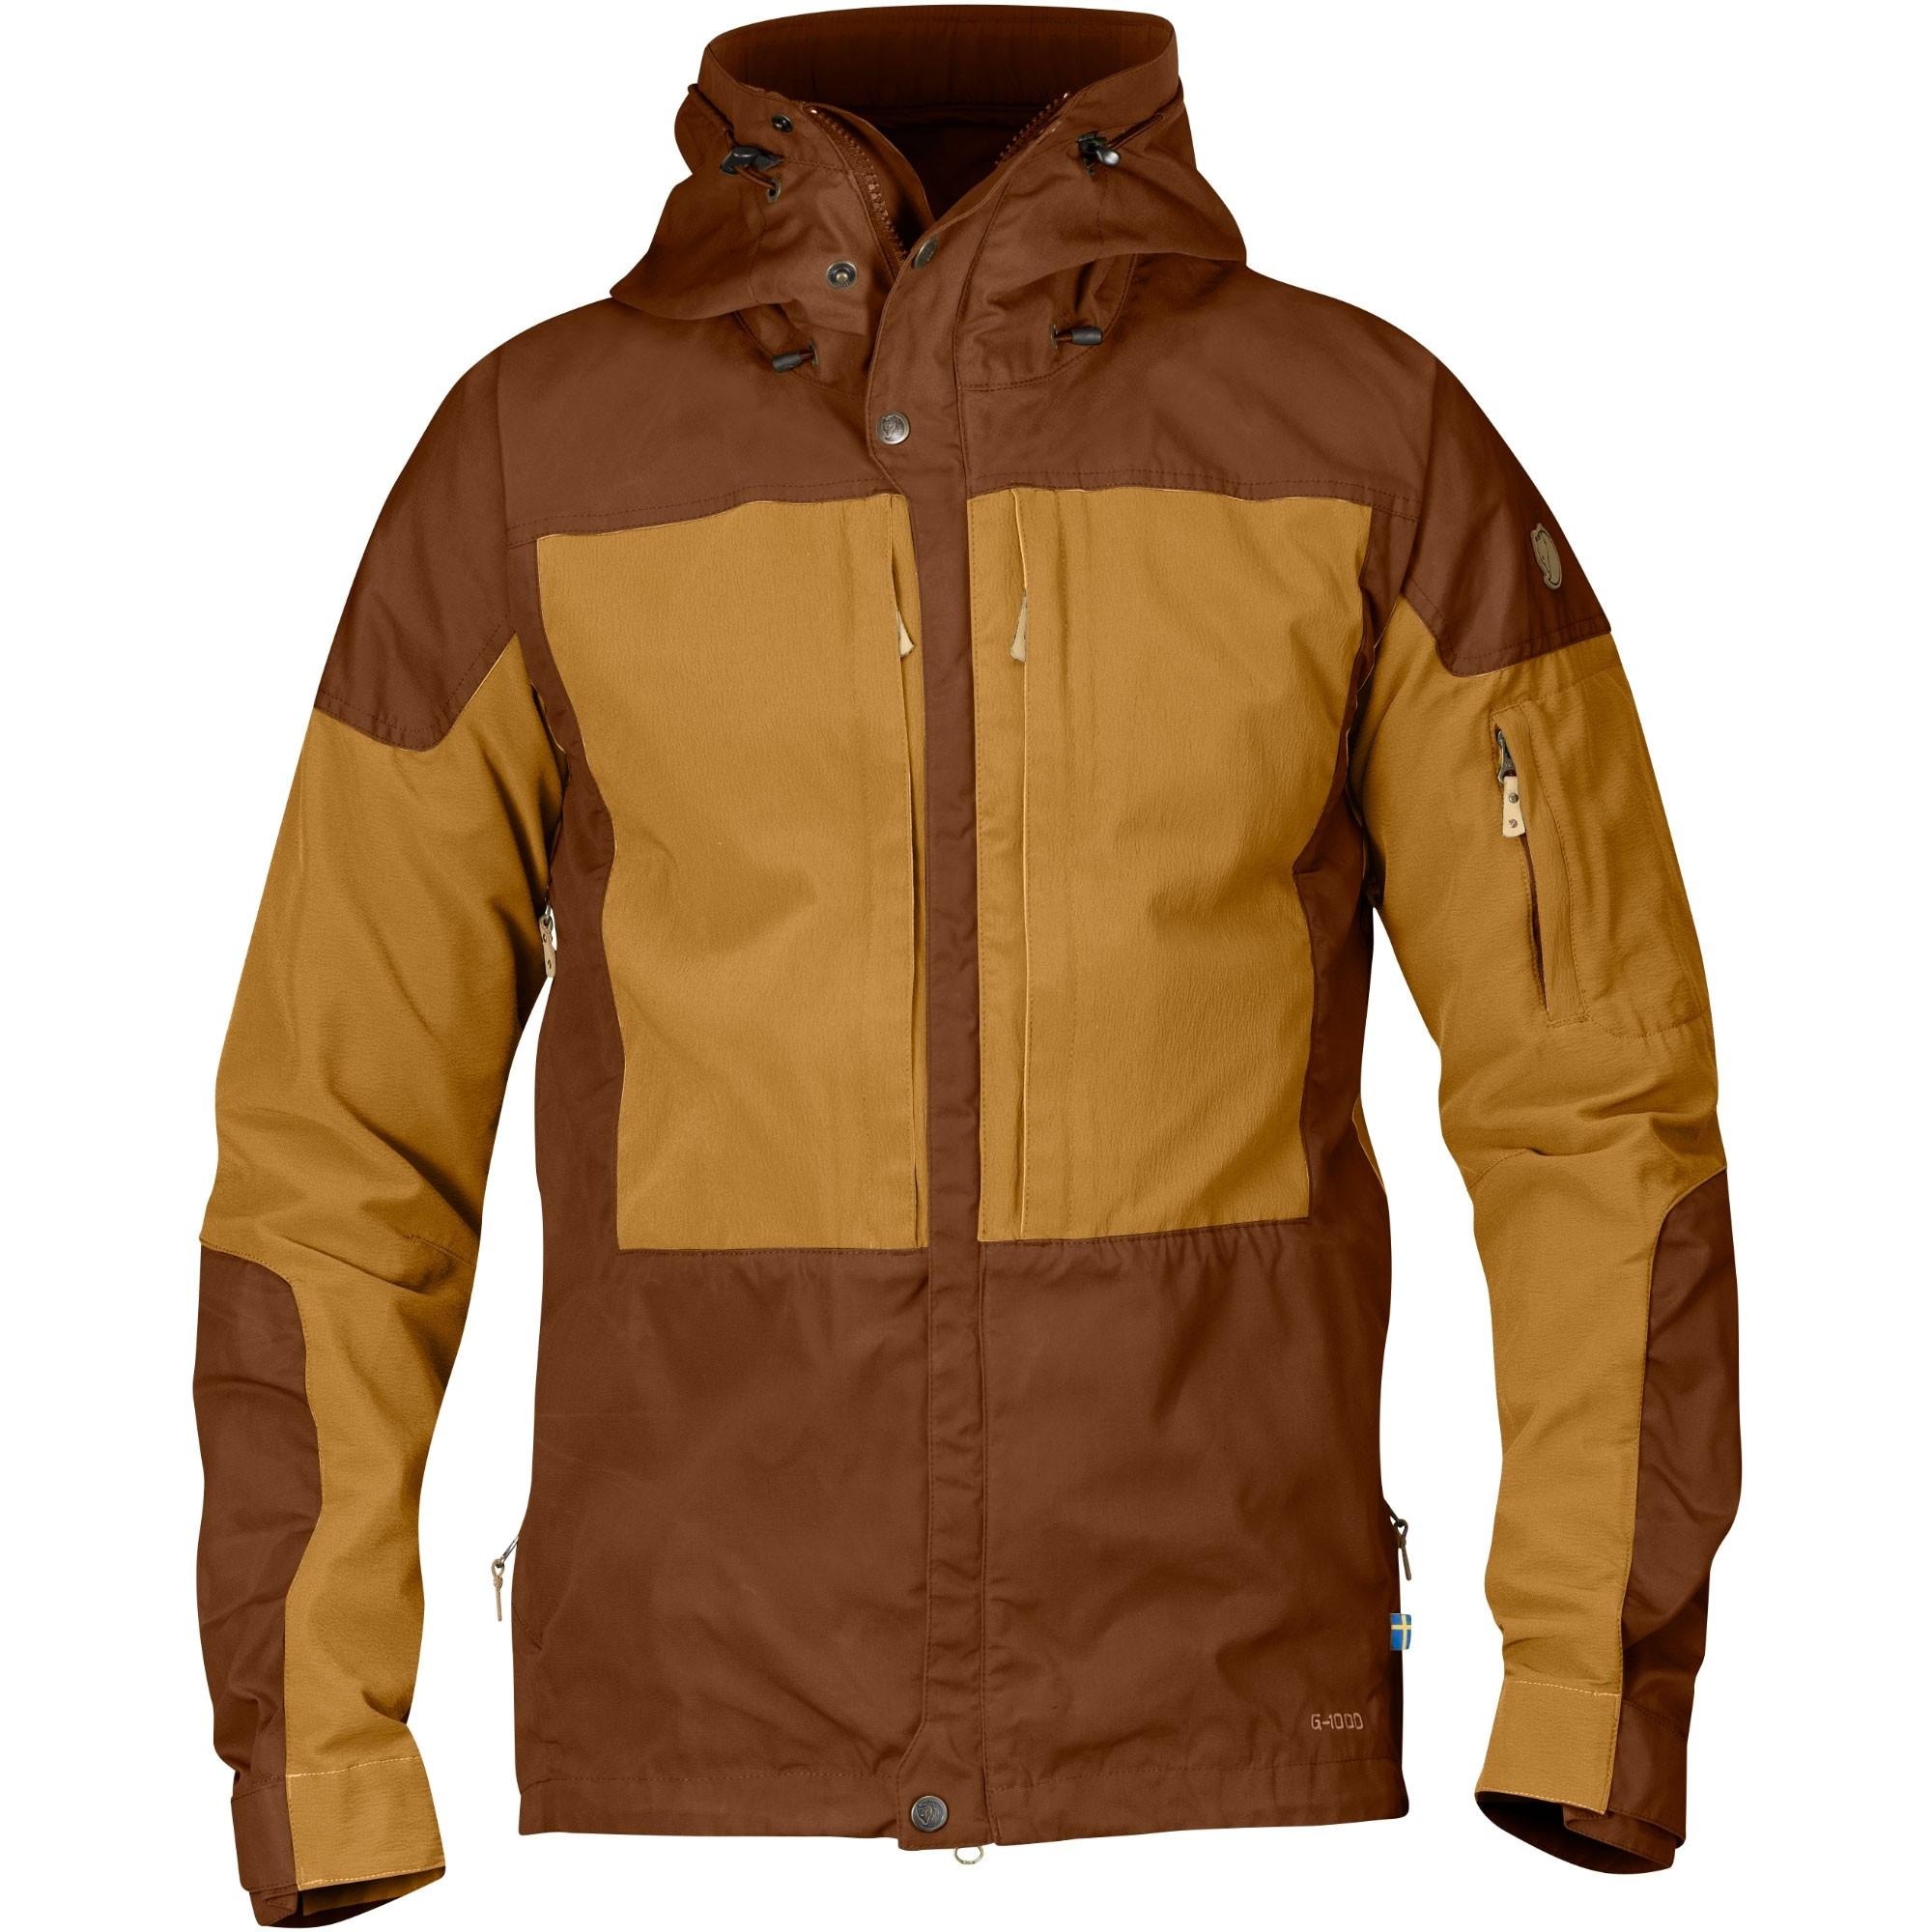 FJALLRAVEN - Keb Men's Jacket - Chestnut/Acorn